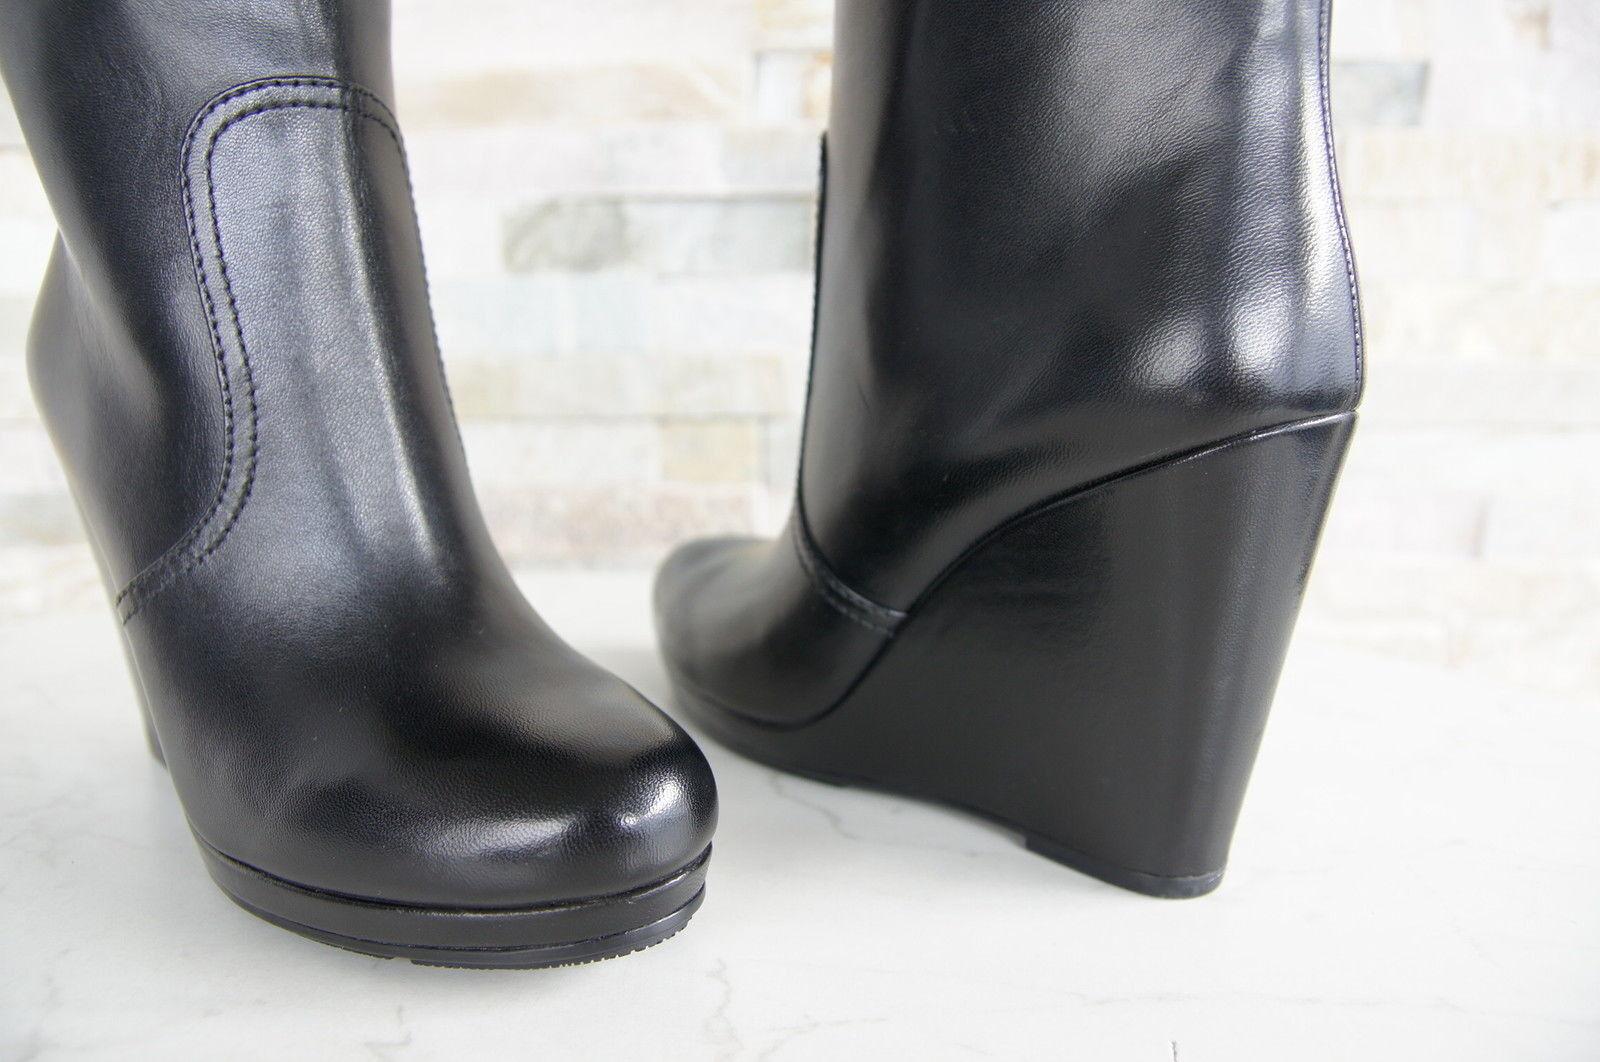 Prada Prada Prada Stiefeletten Gr 37,5 Damen Stiefelies Schuhe 3UZ005 schwarz NEU ehem 817cf8